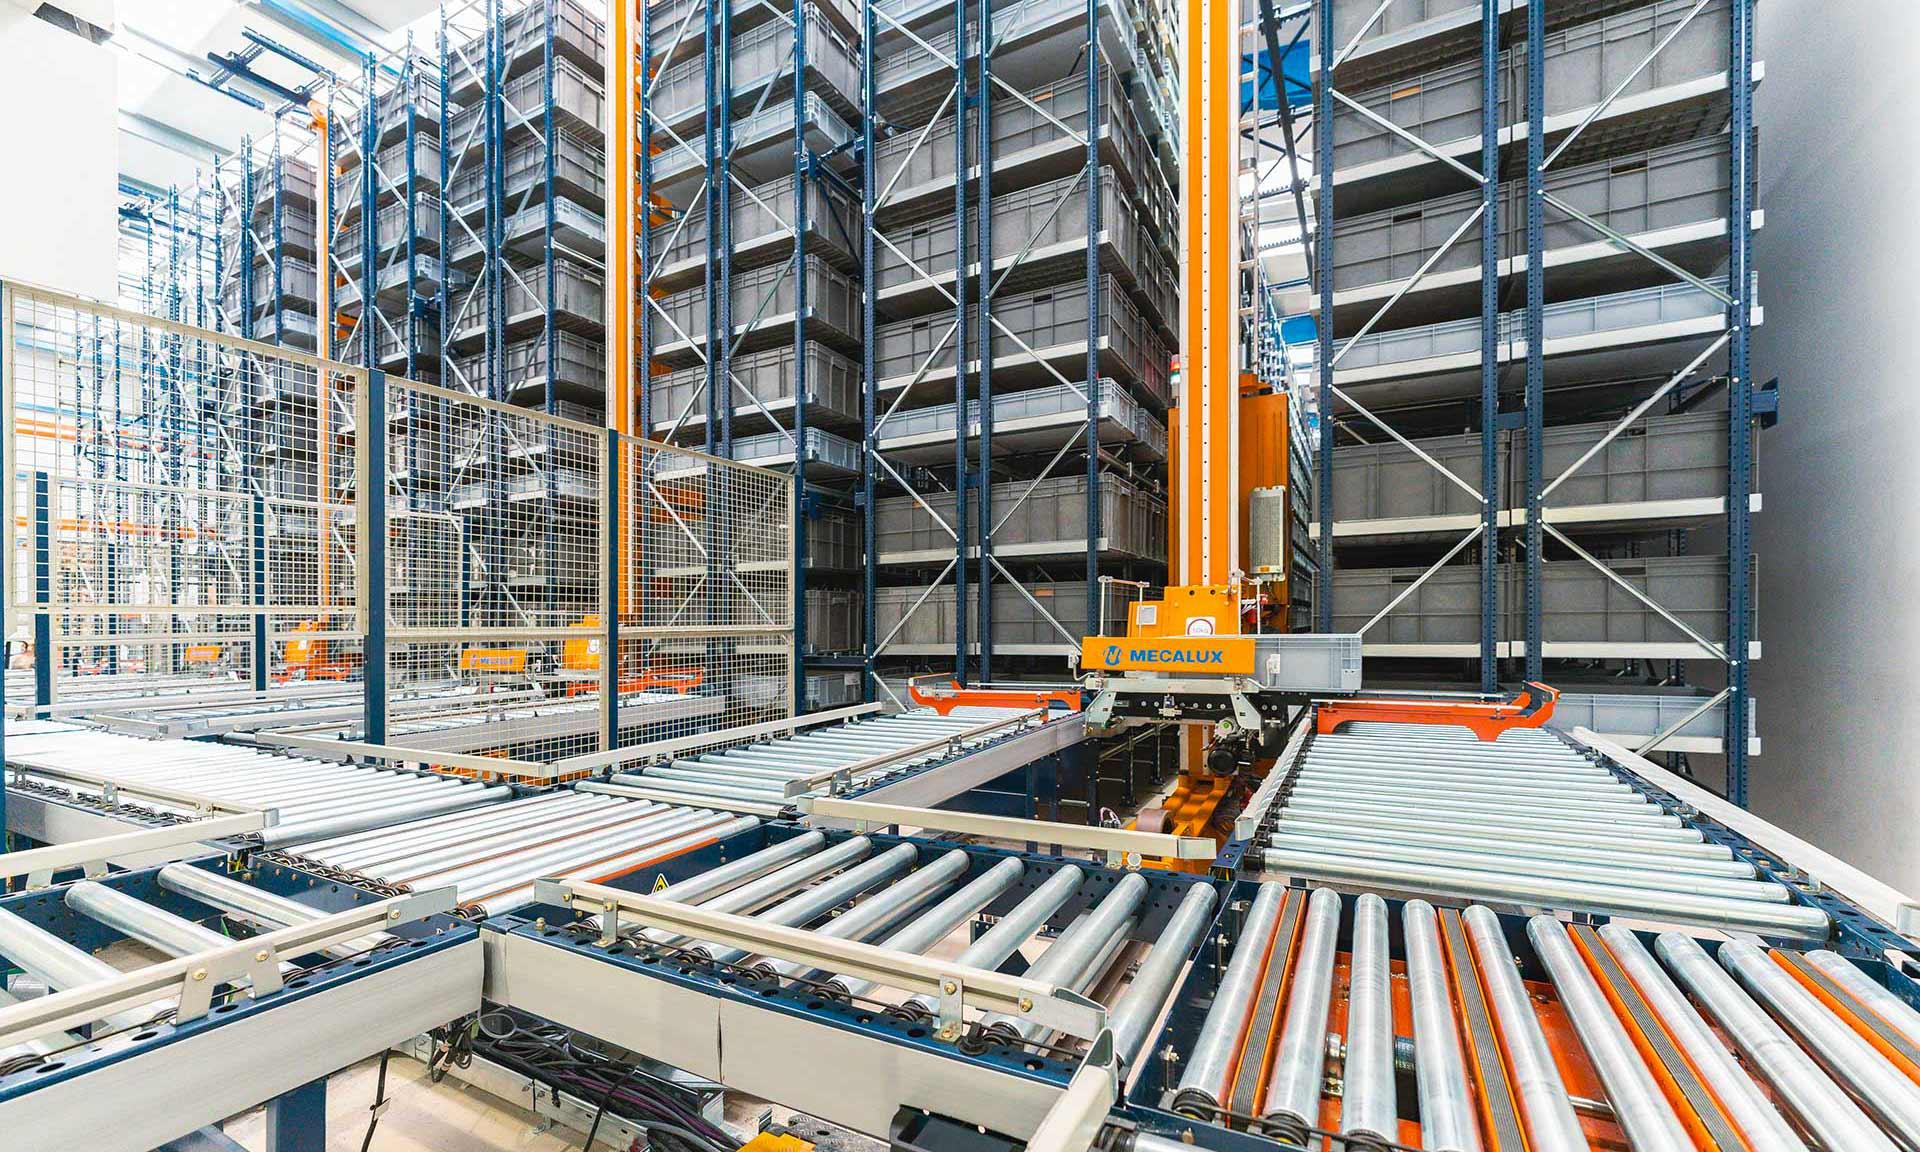 Normagrup: Automatisierung bringt Logistik zum Leuchten